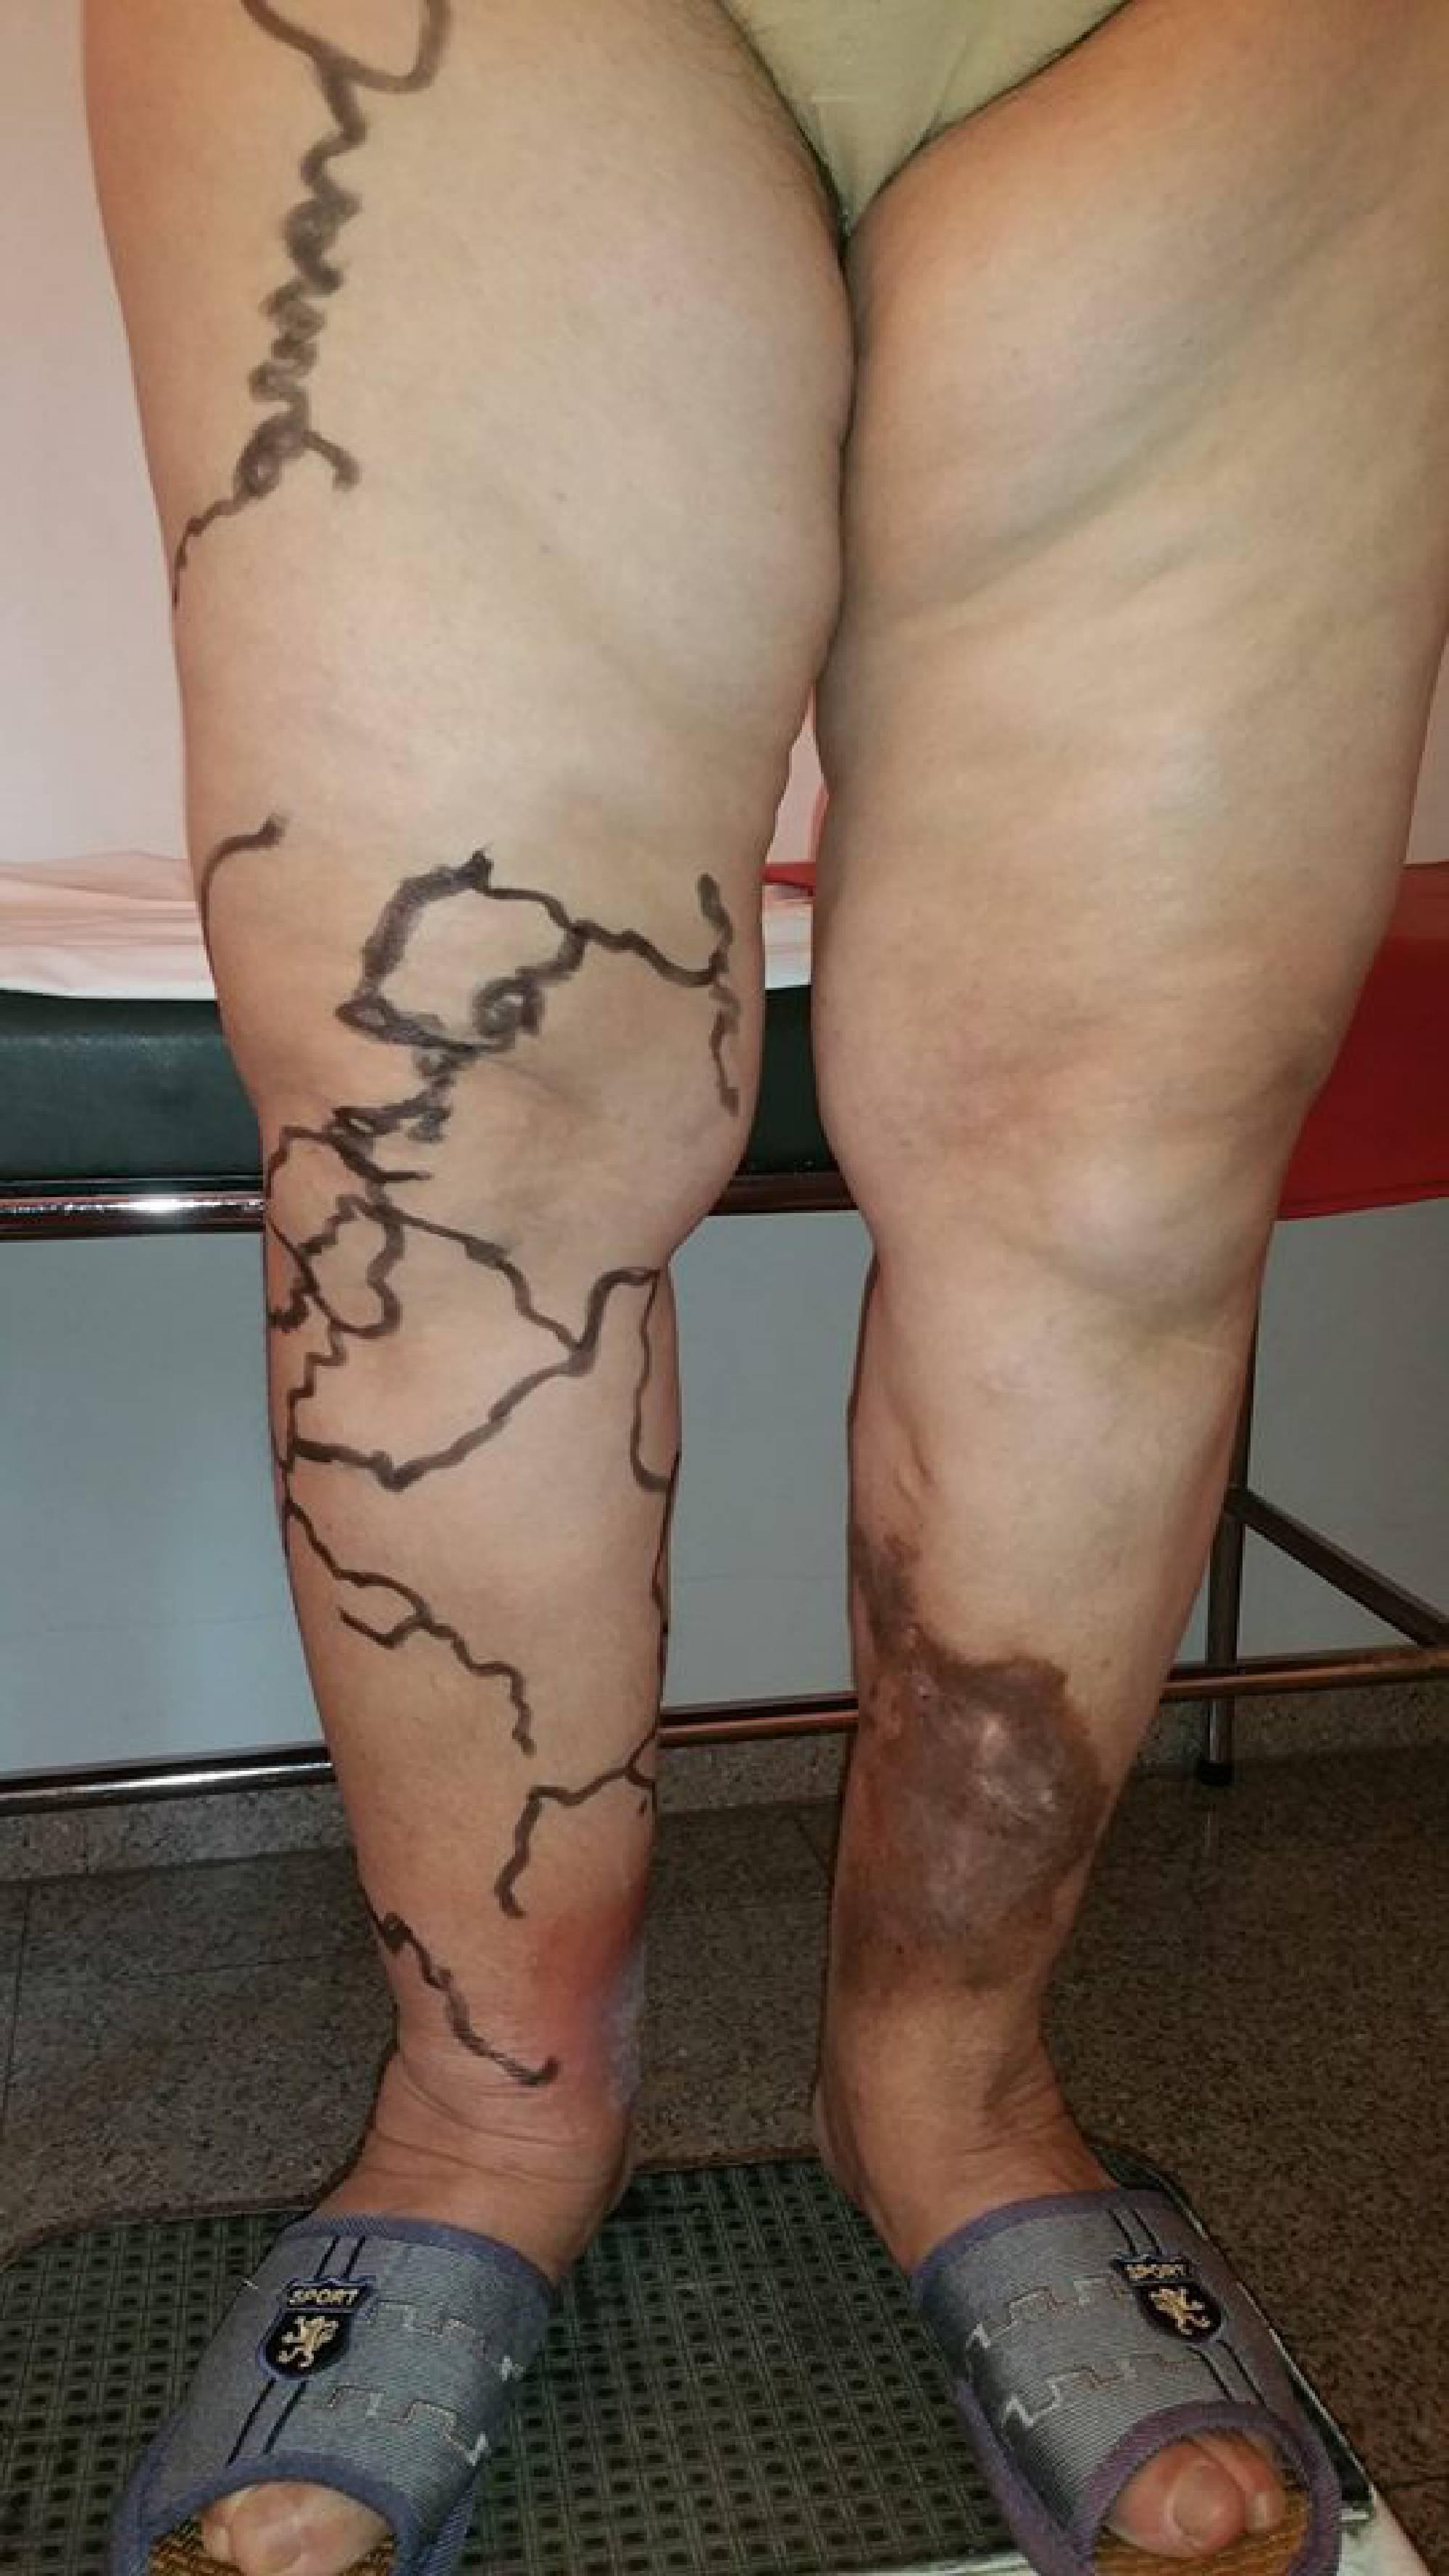 chirurgie laser varicoză pe picioare preț